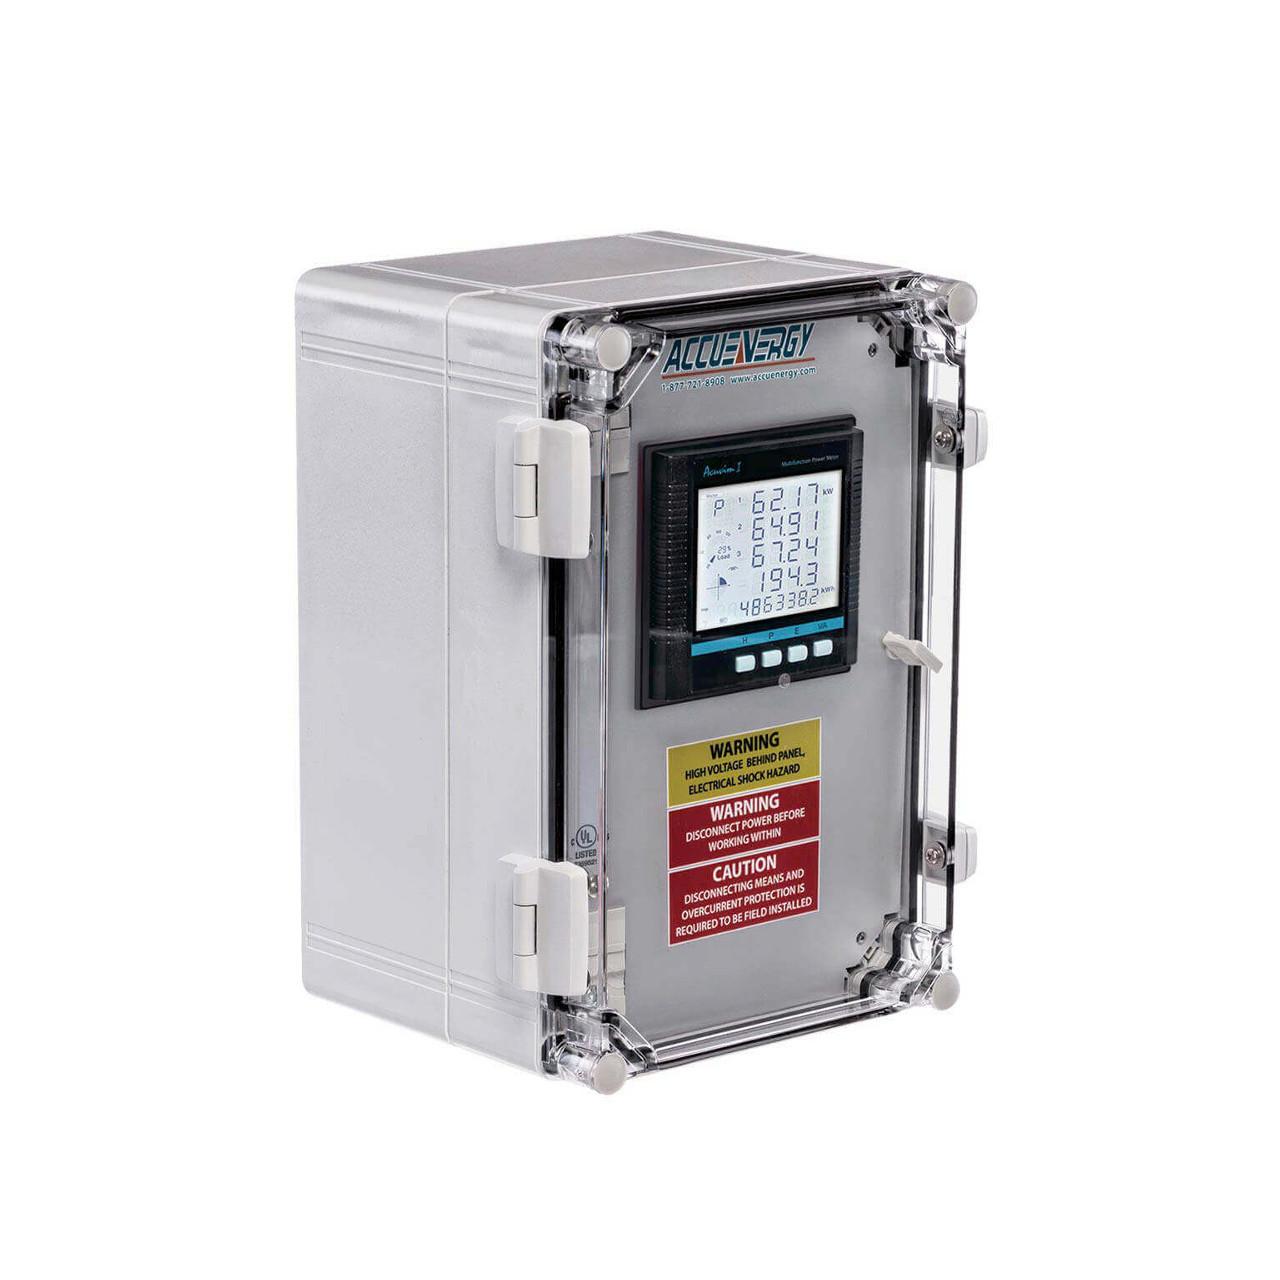 AccuEnergy_AcuPanel-9104X-P4-Kit-Rogowski-2